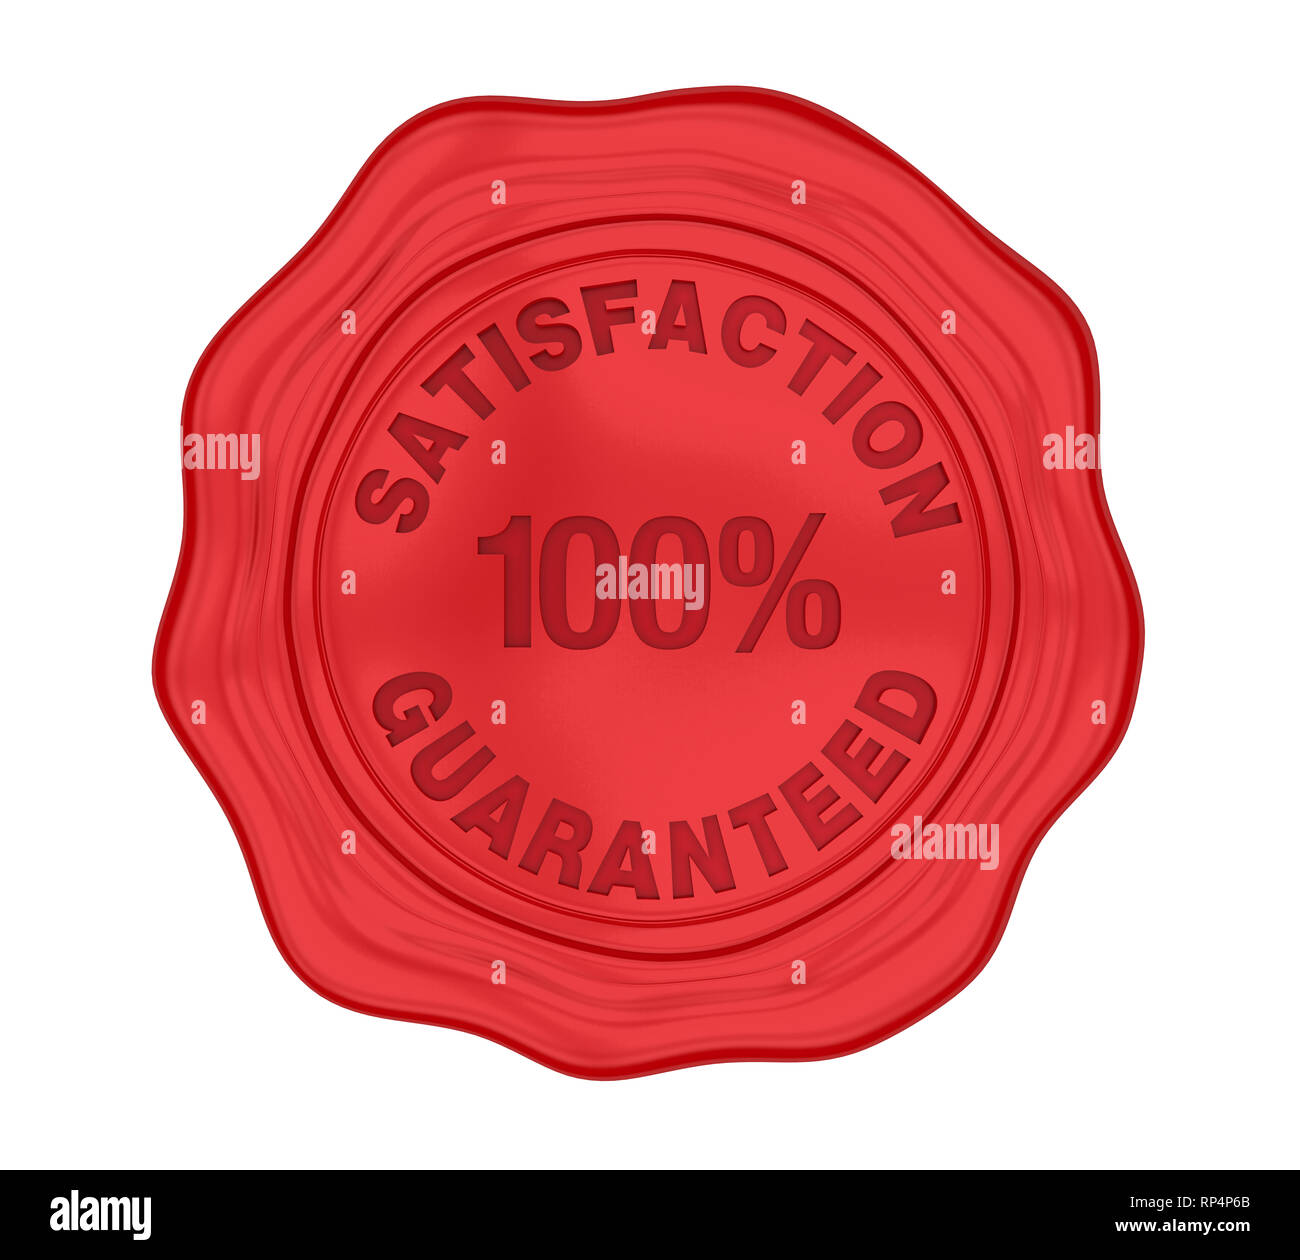 100% Satisfaction Guaranteed Wax Seal Isolated - Stock Image